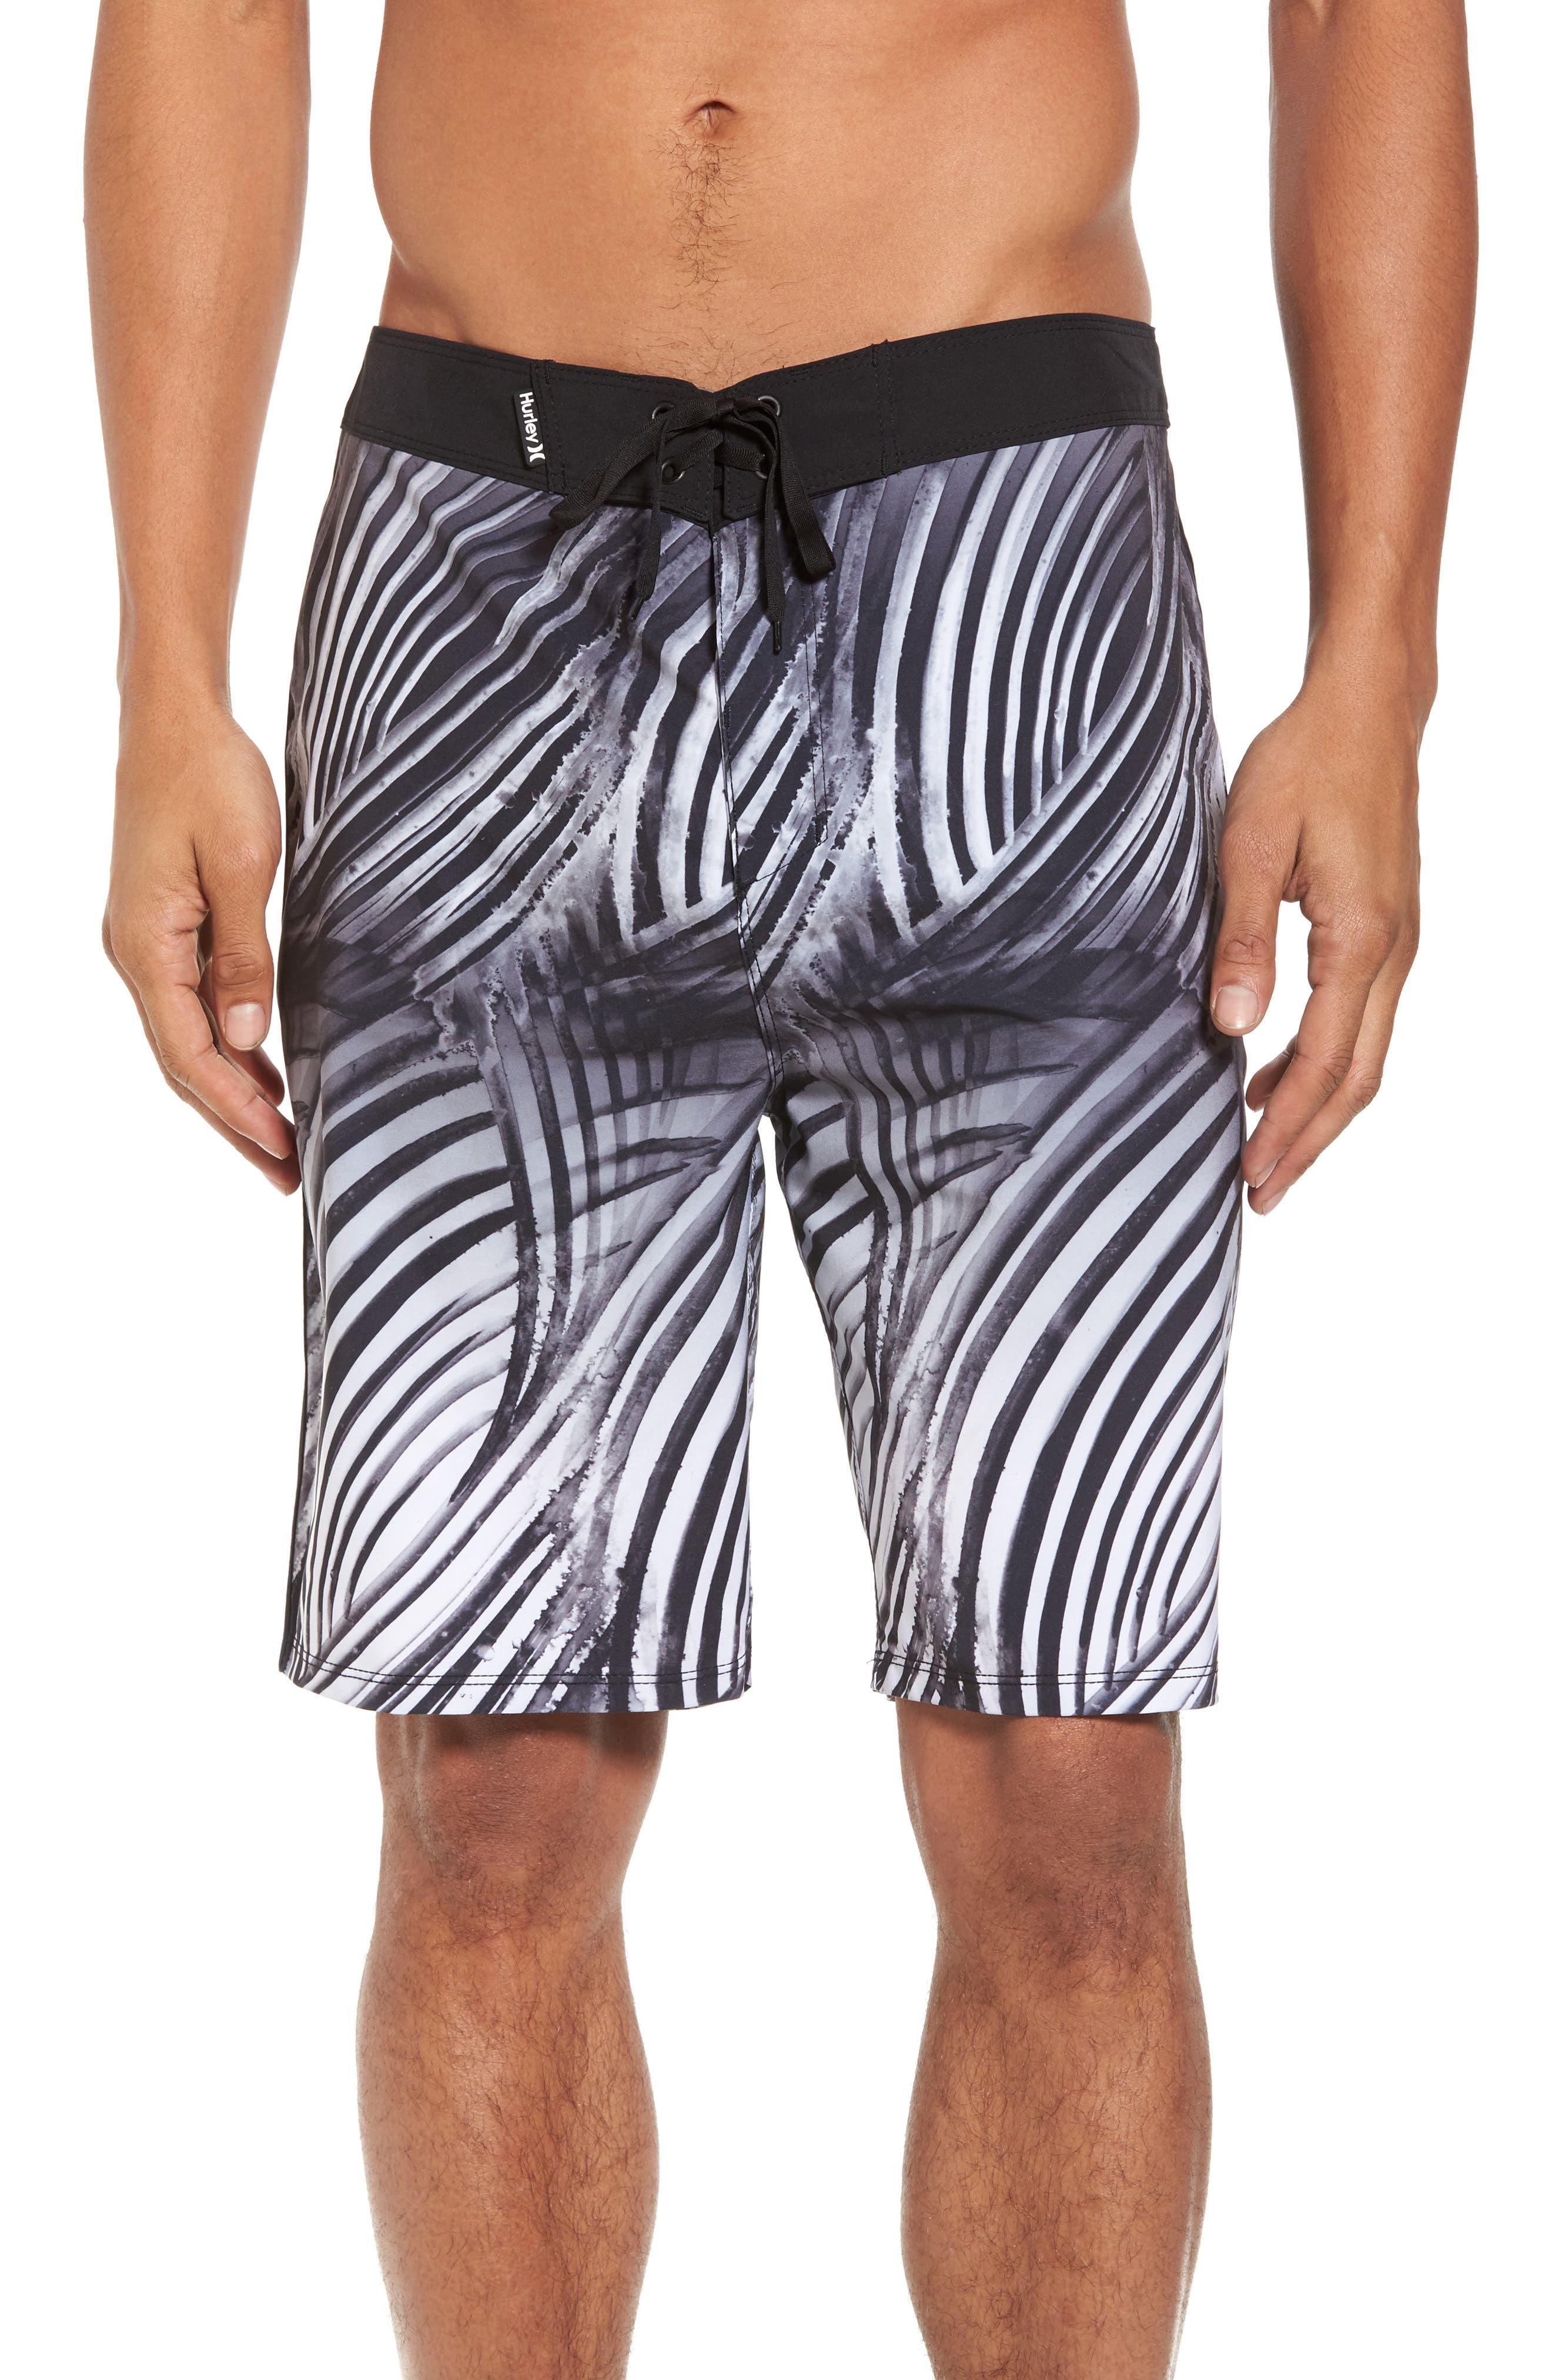 Hurley Phantom Crest Board Shorts